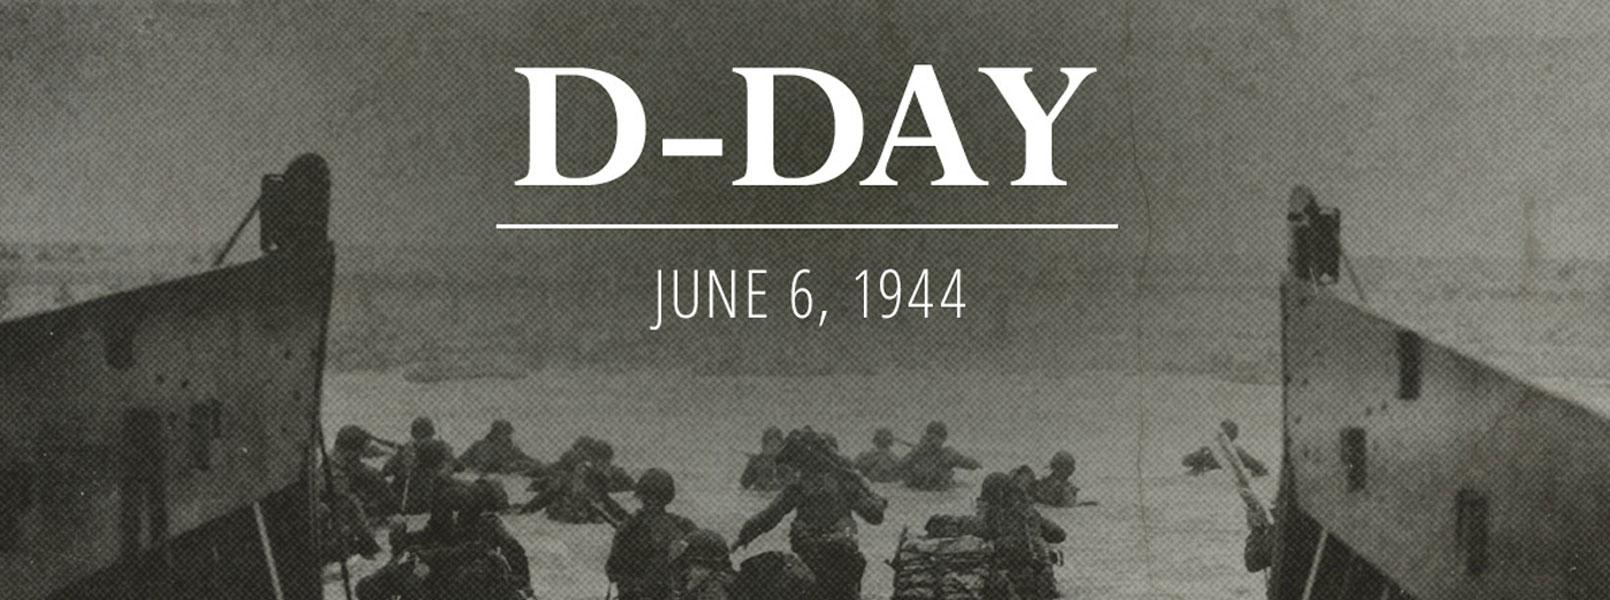 D-Day-wide.jpg